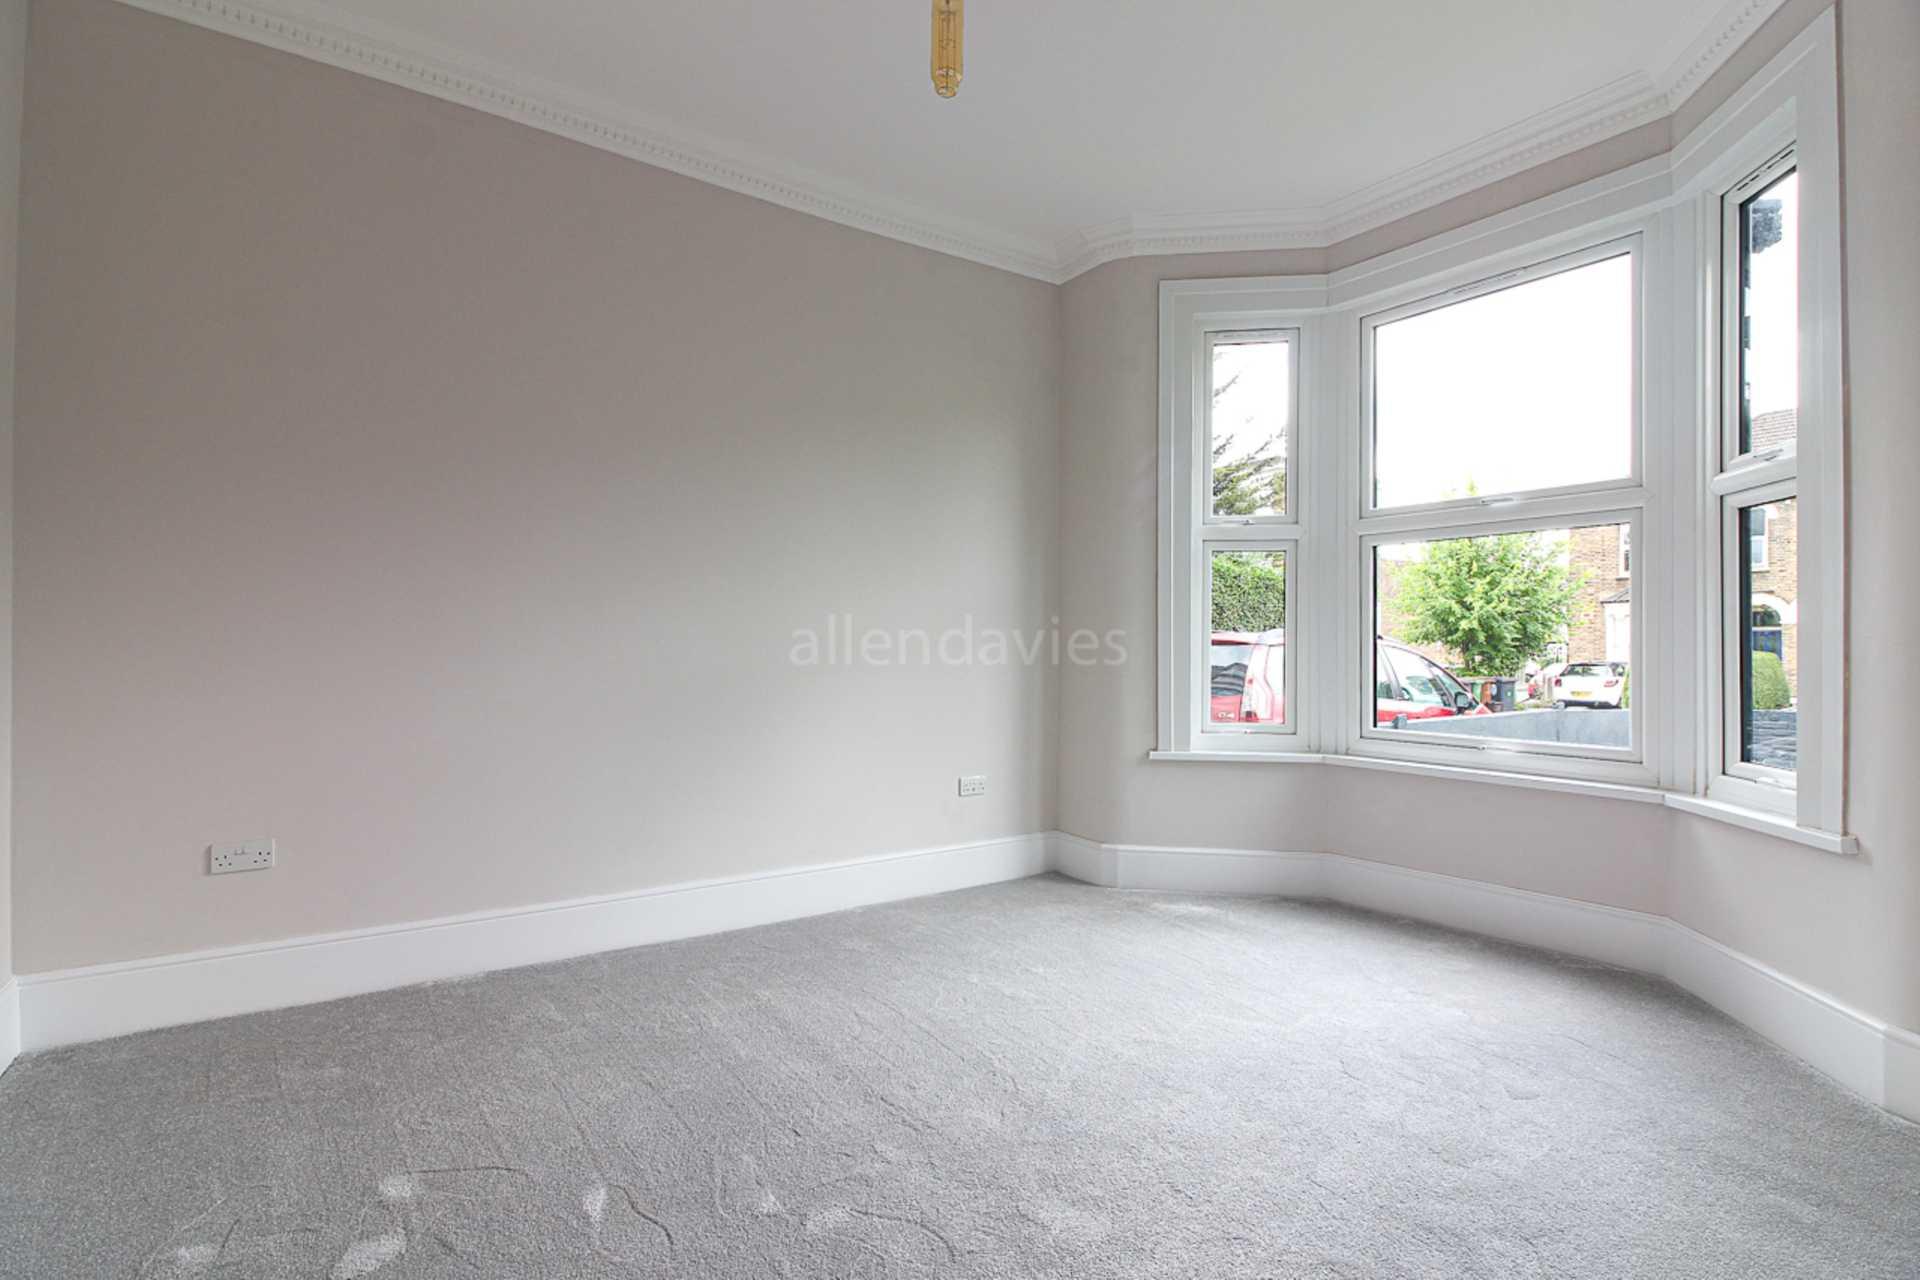 Bulwer Road, Leytonstone, E11, Image 17